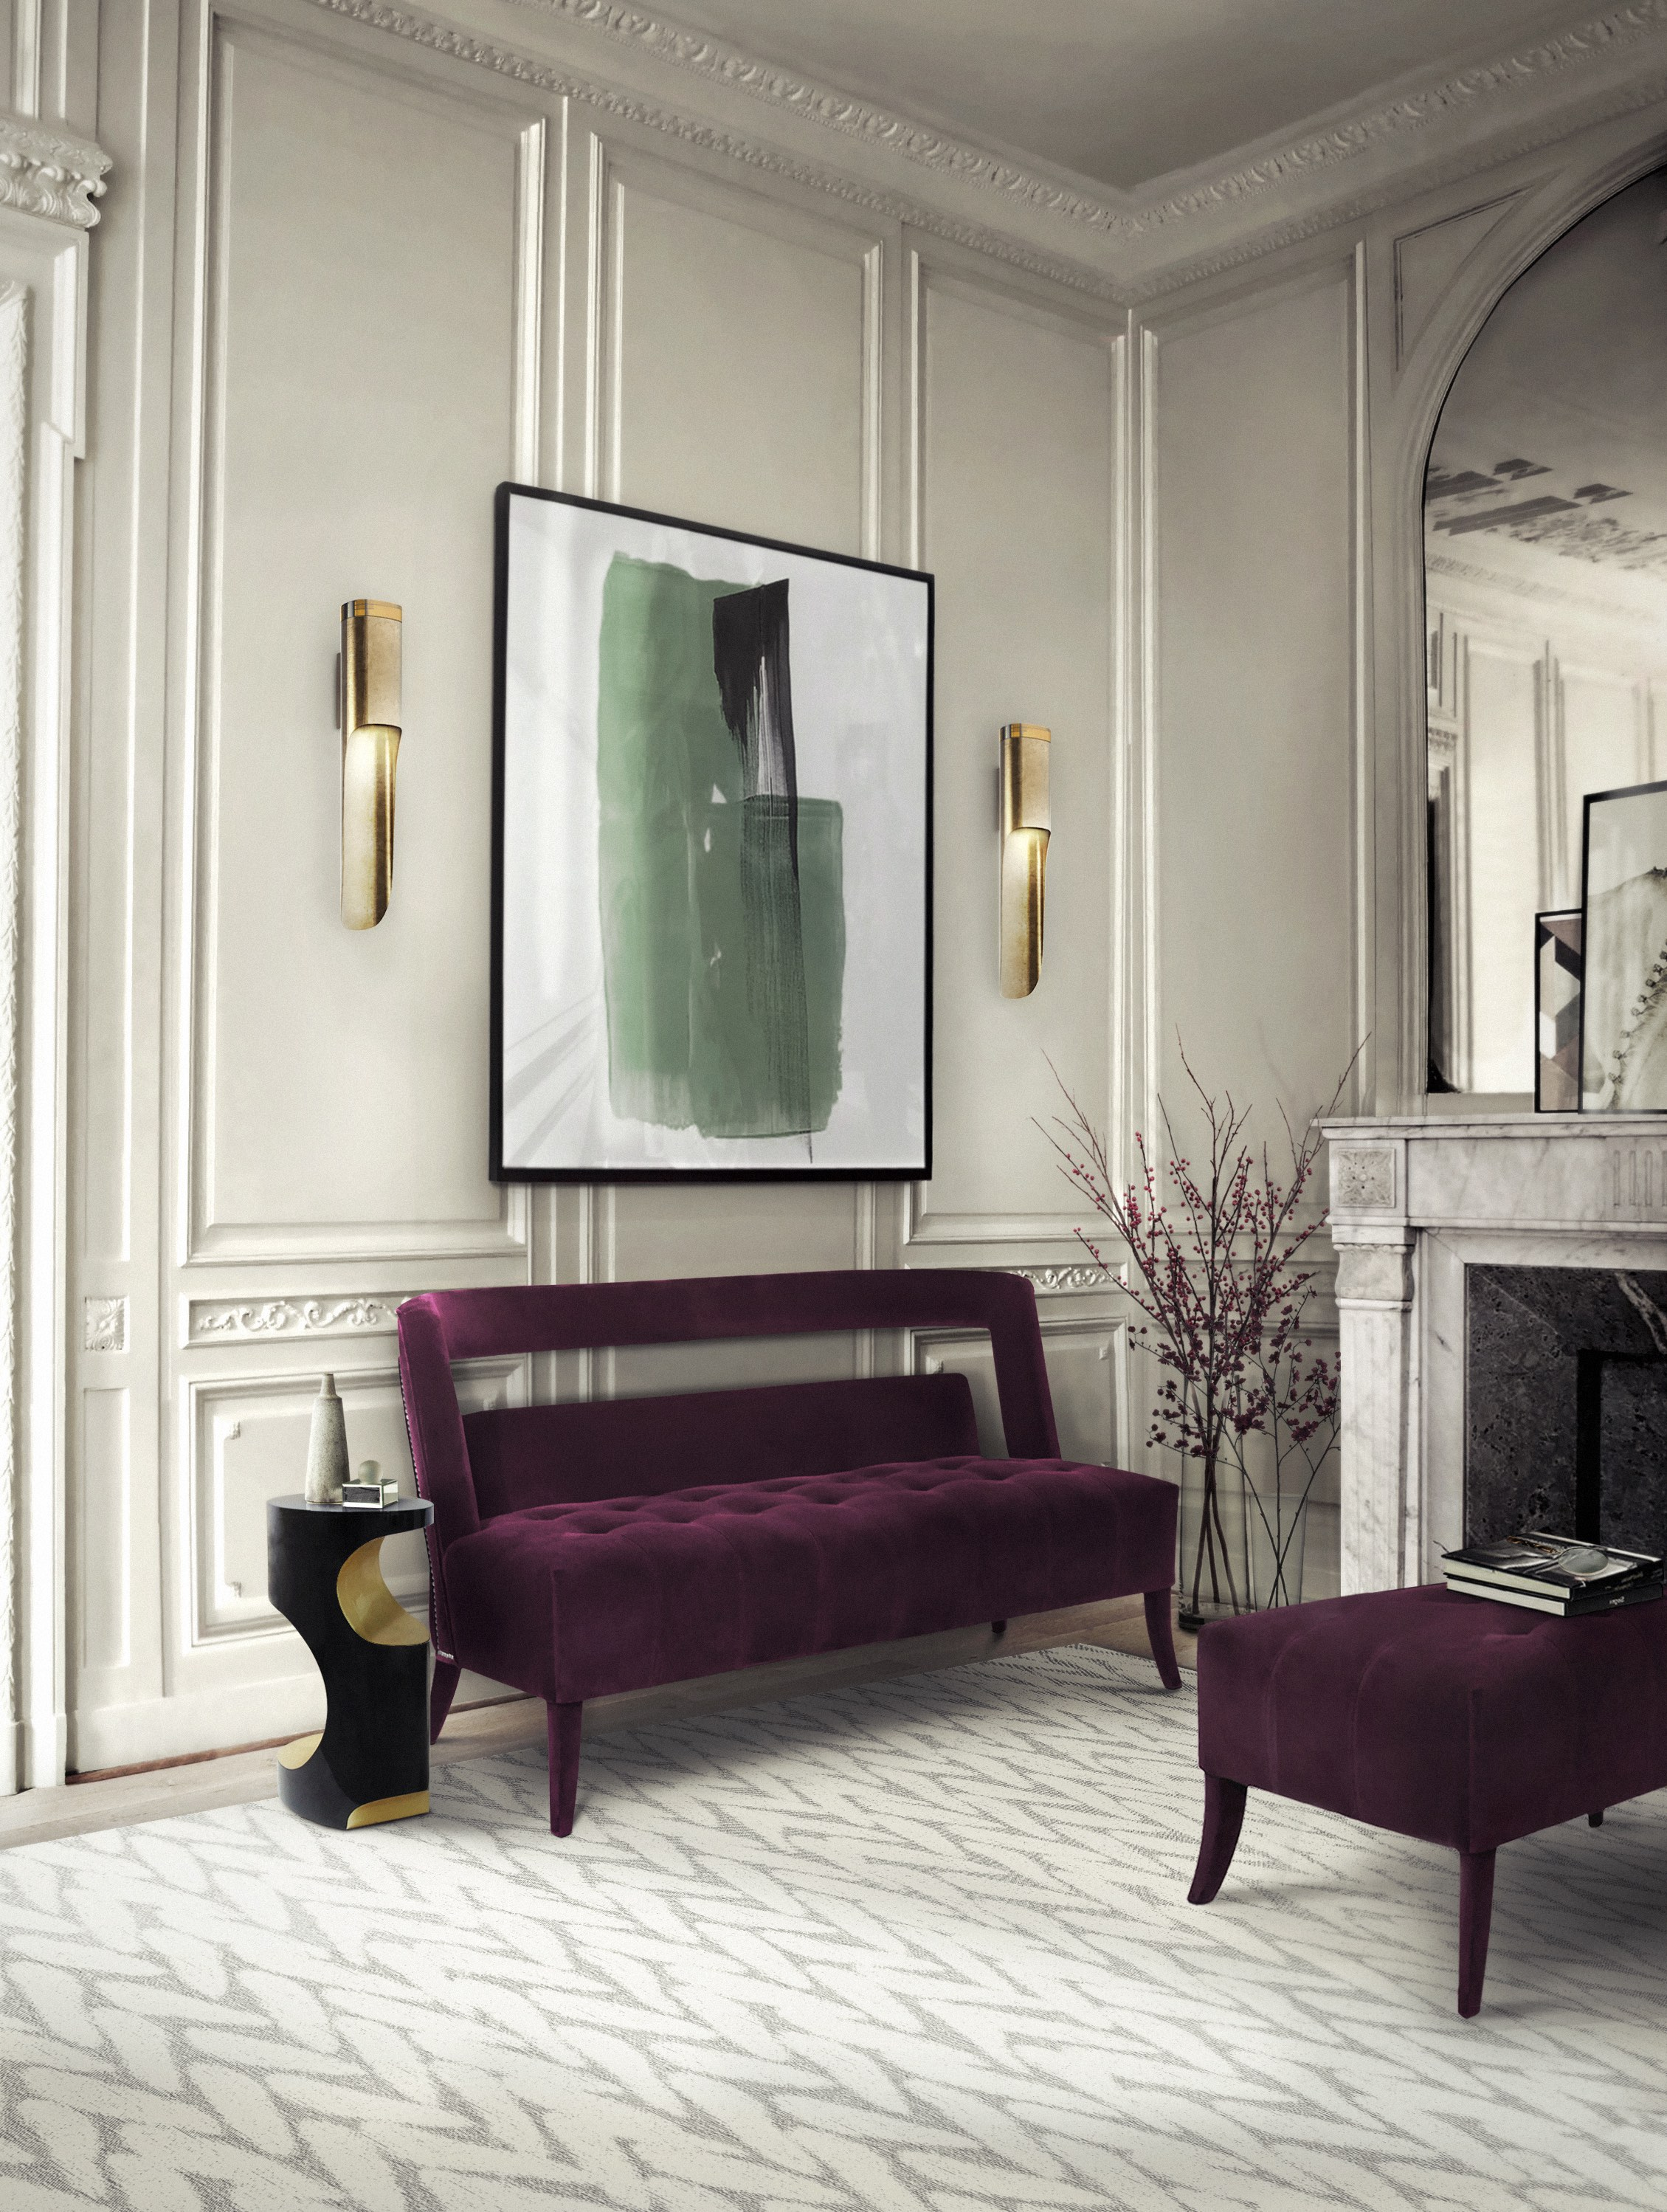 Meet These BRABBU's Modern Sofas Modern Sofas Meet These BRABBU's Modern Sofas Meet These BRABBUs Modern 9